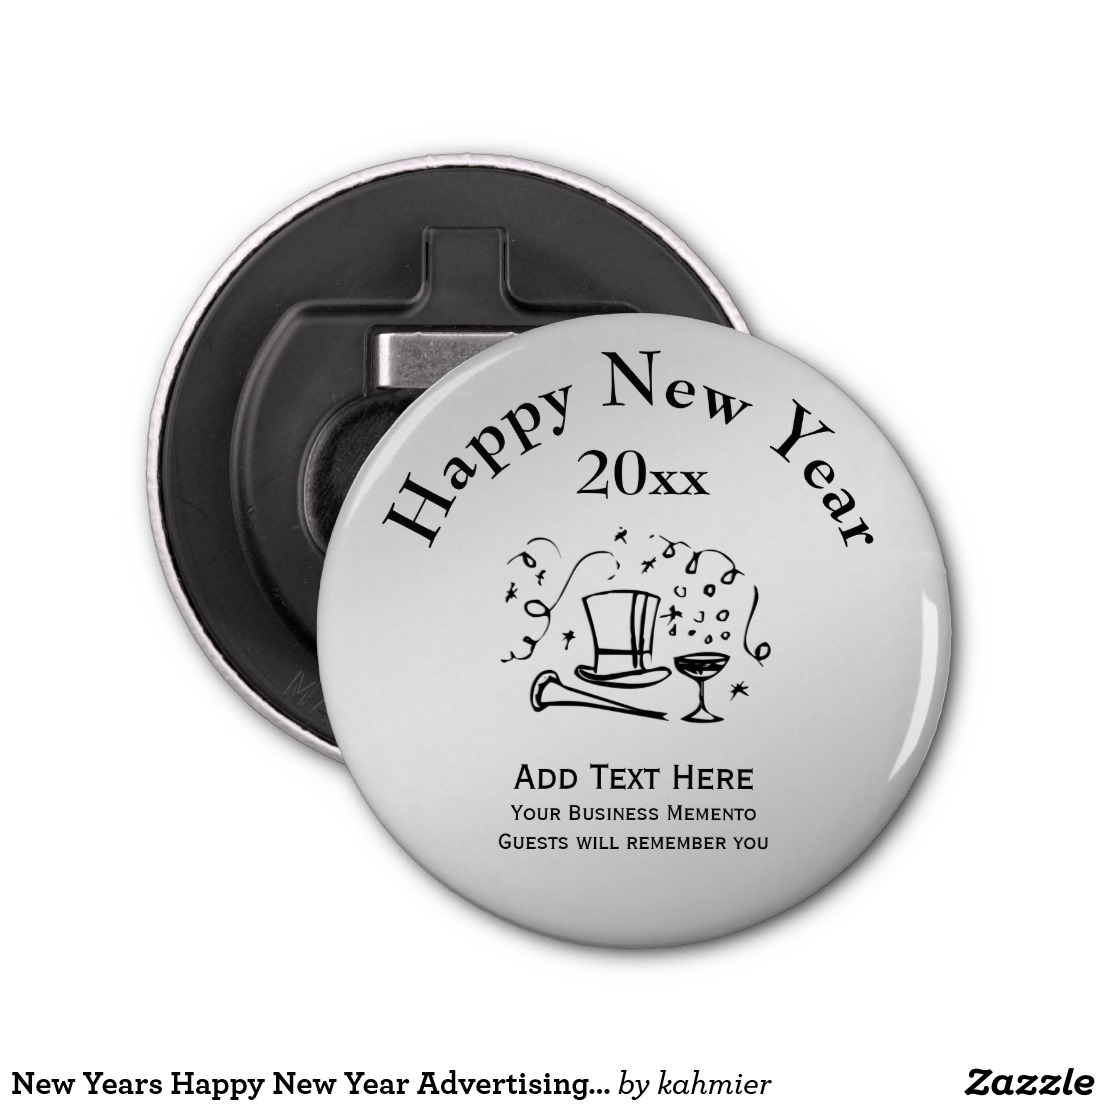 New Years Happy New Year Advertising Memento Bottle Opener